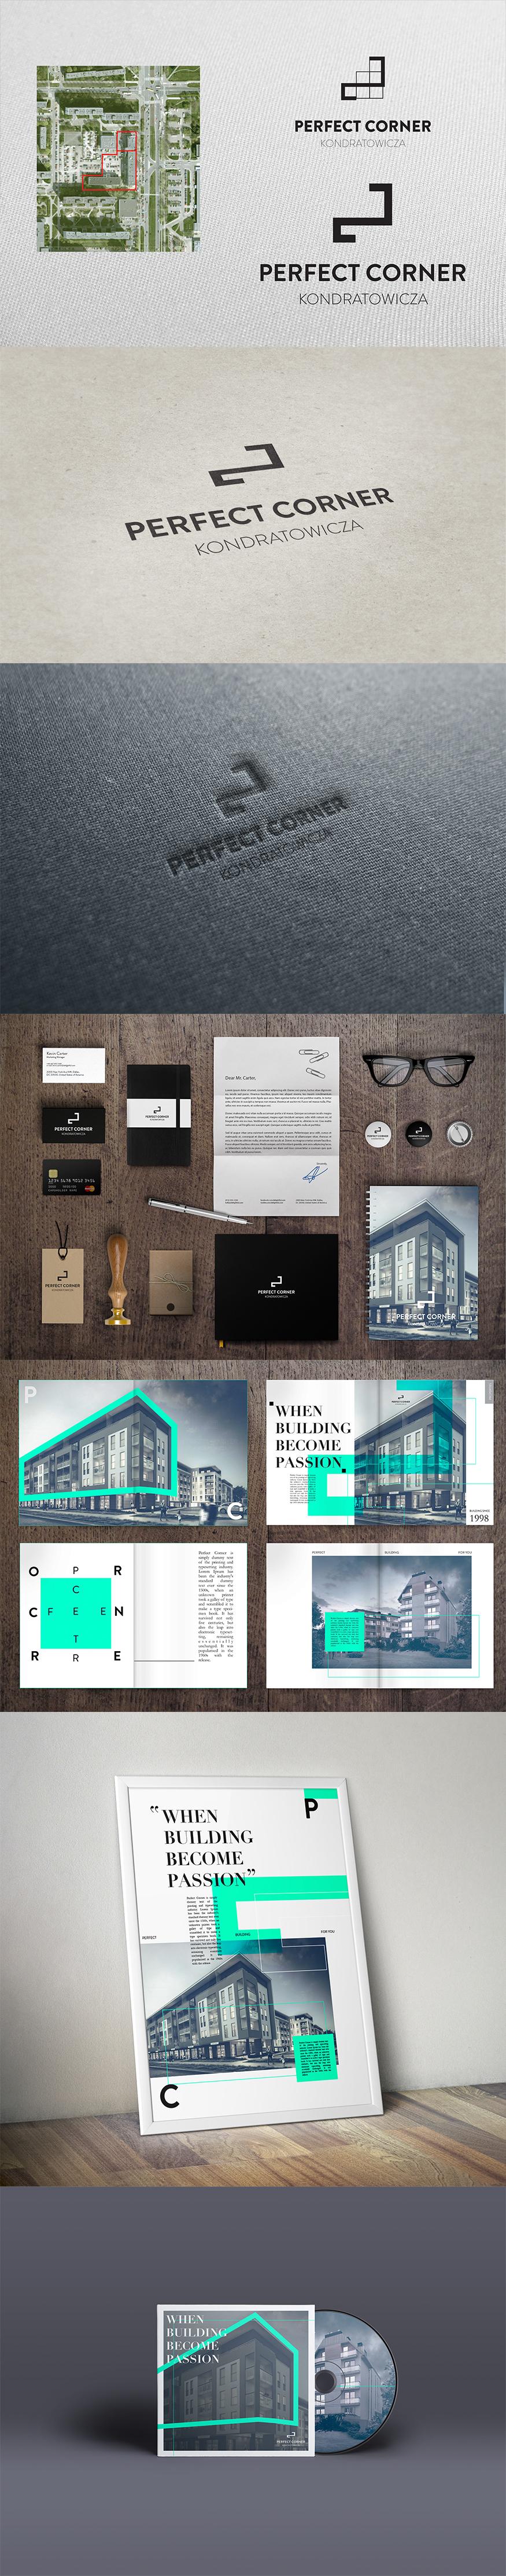 ewelinagaska.com logo folder building developer brand home perfect magazine cloud warsaw